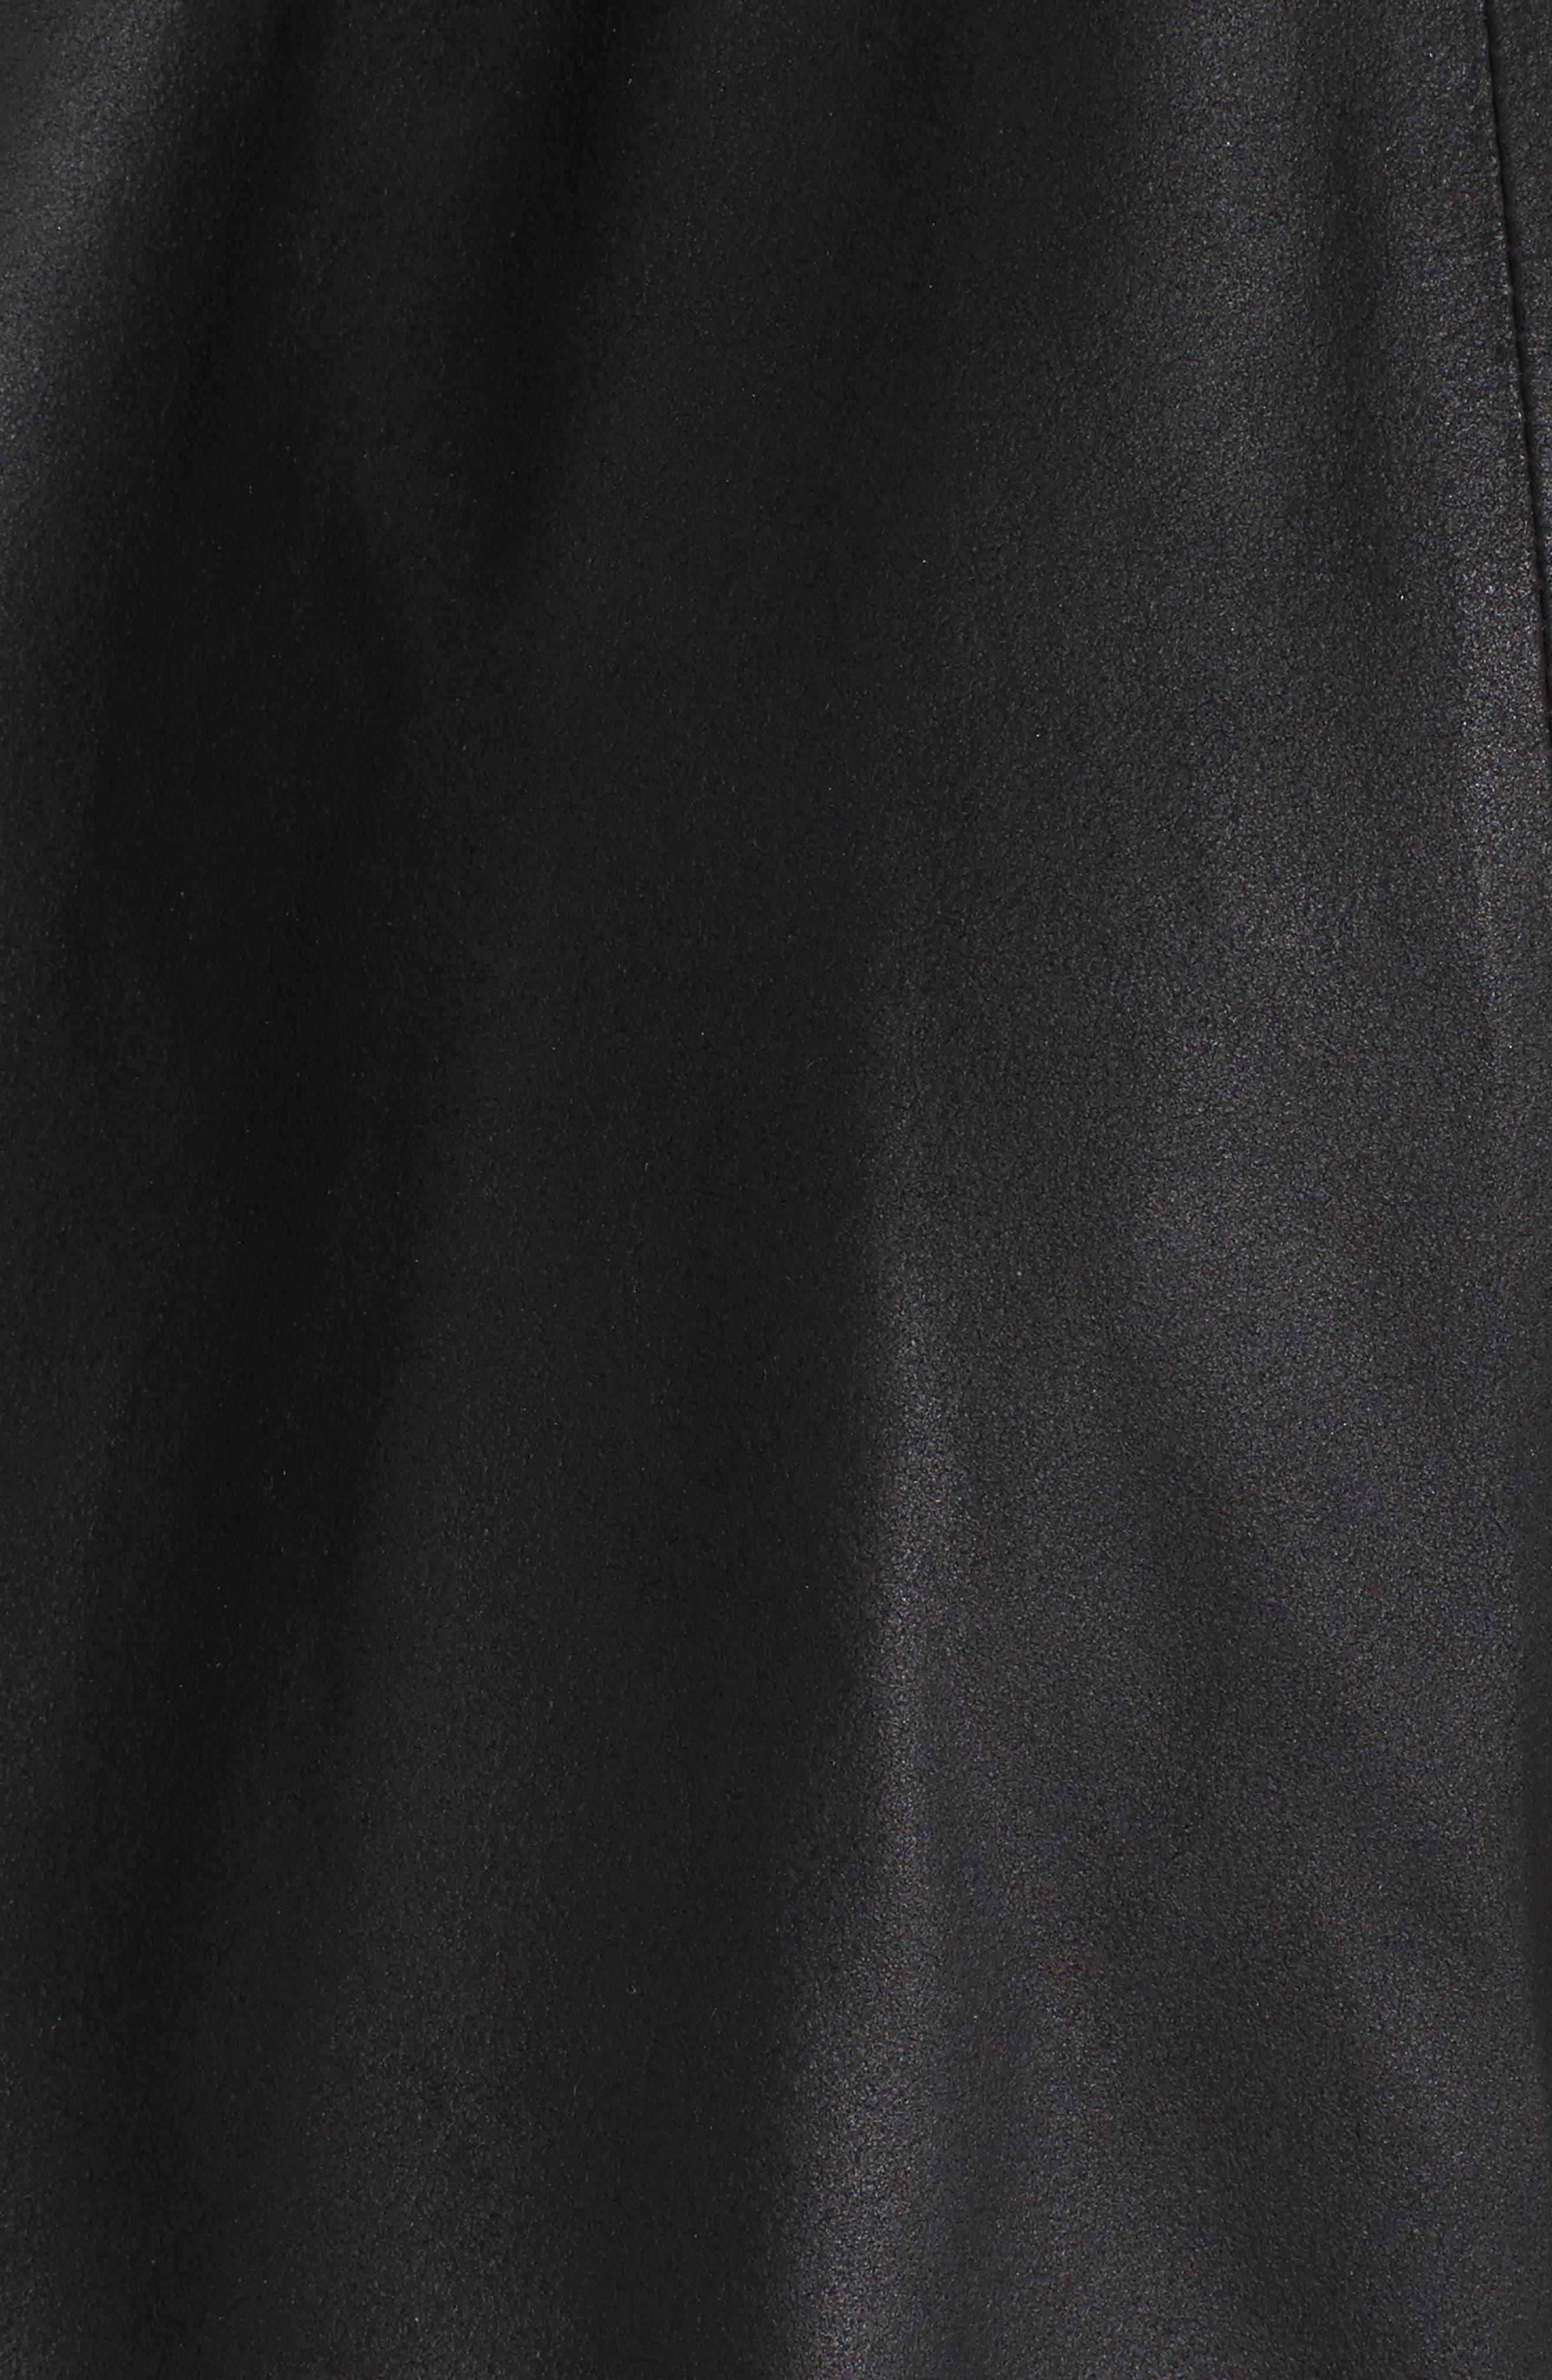 Brycen Leather Drape Front Jacket,                             Alternate thumbnail 6, color,                             001